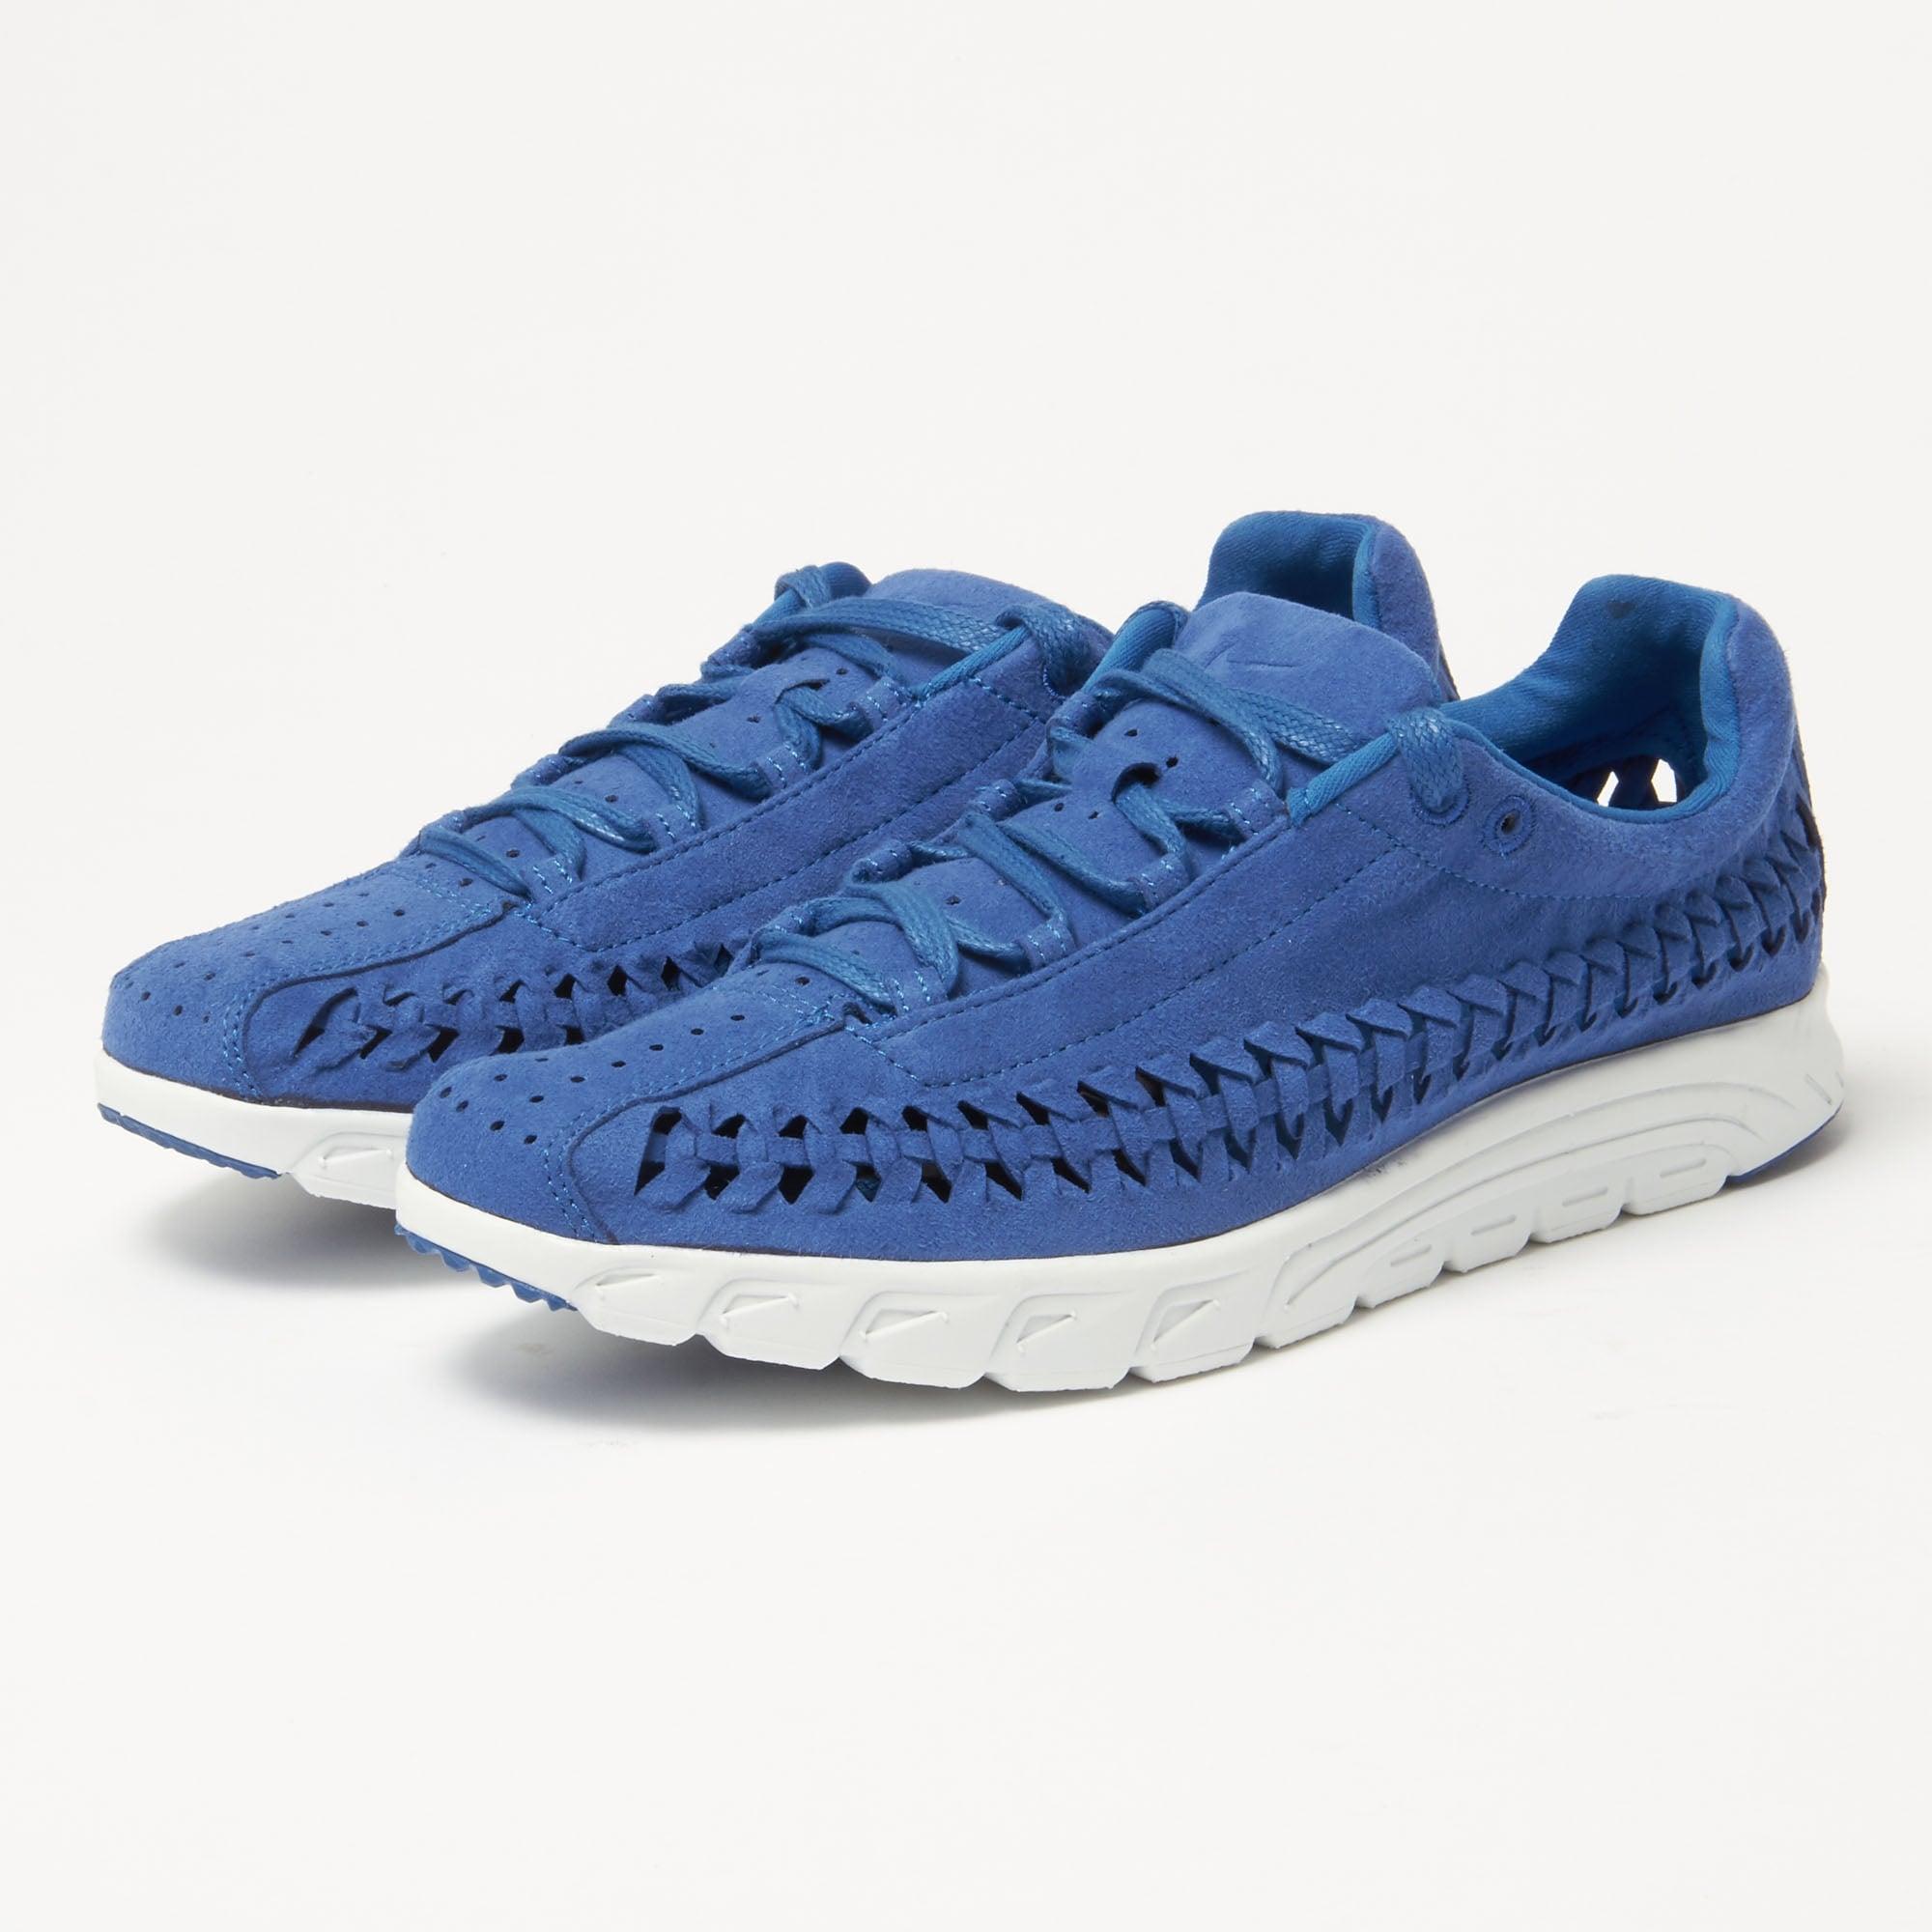 info for fa711 2de3d Lyst - Nike Mayfly Woven Royal Blue Sneakers 833132-401 in Blue for Men